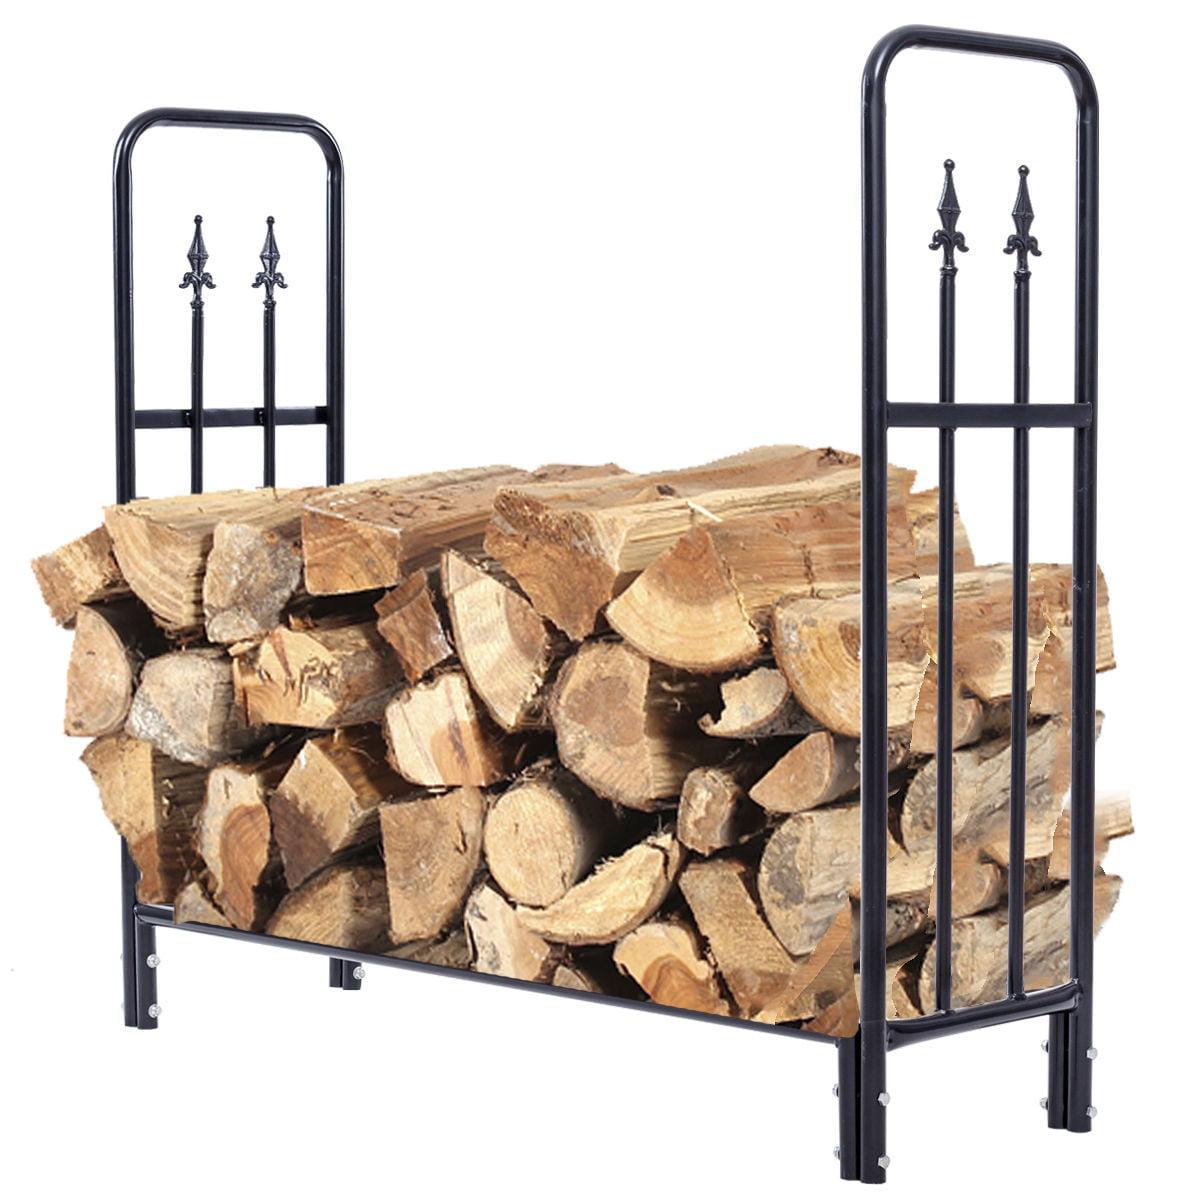 Costway 4 Feet Outdoor Heavy Duty Steel Firewood Log Rack Wood Storage Holder Black